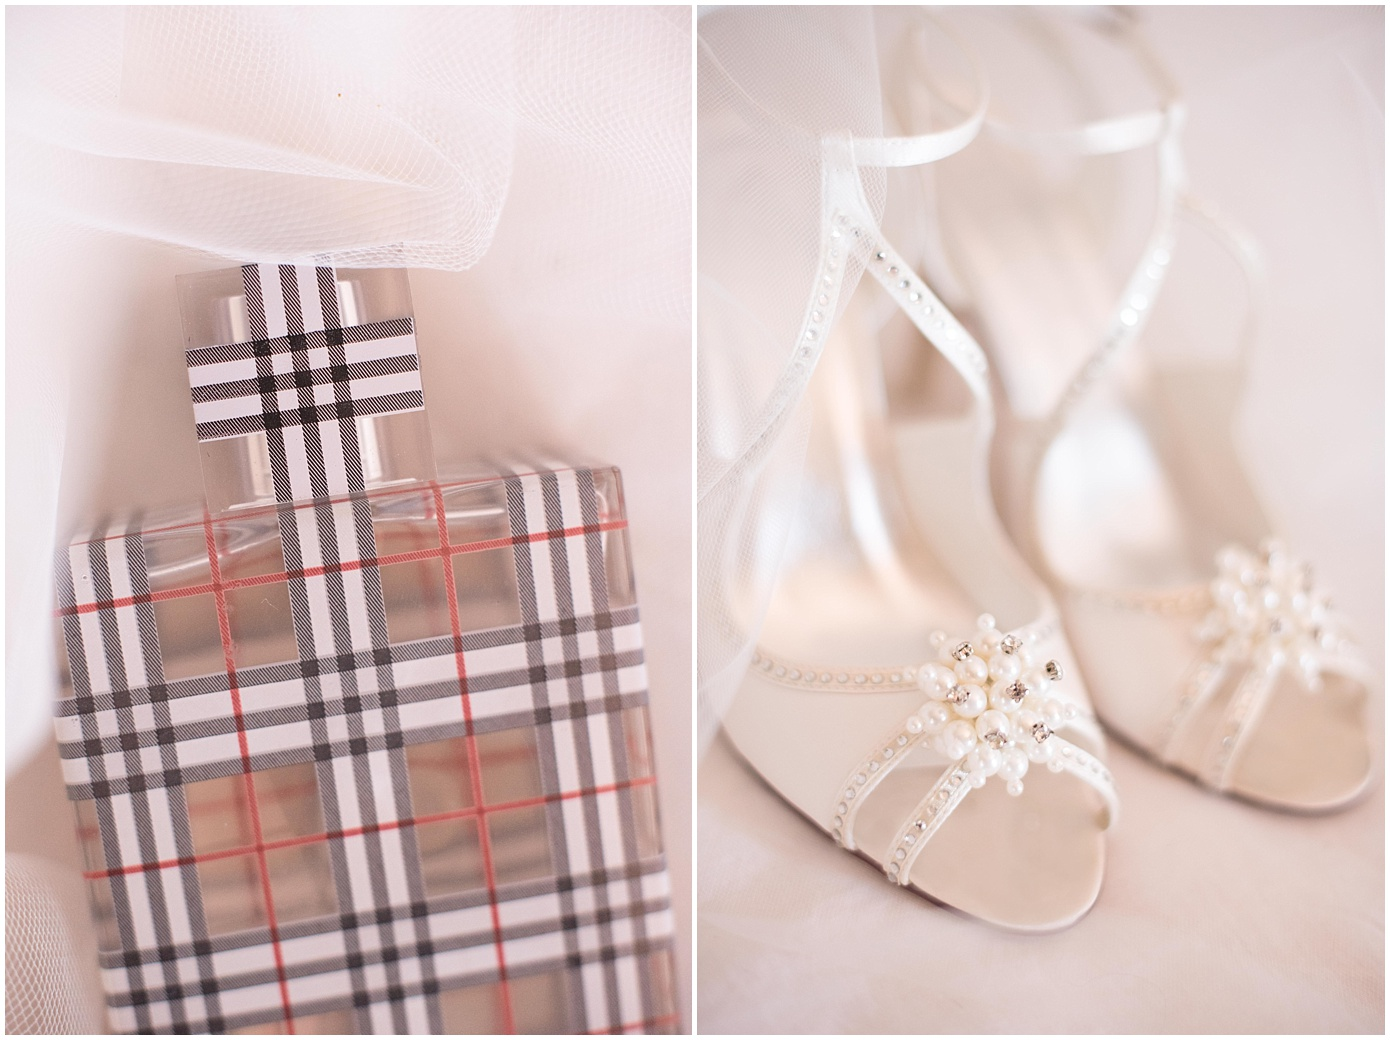 kayla kitts photography-justine-brian-wedding-balloon-fiesta_0011.jpg